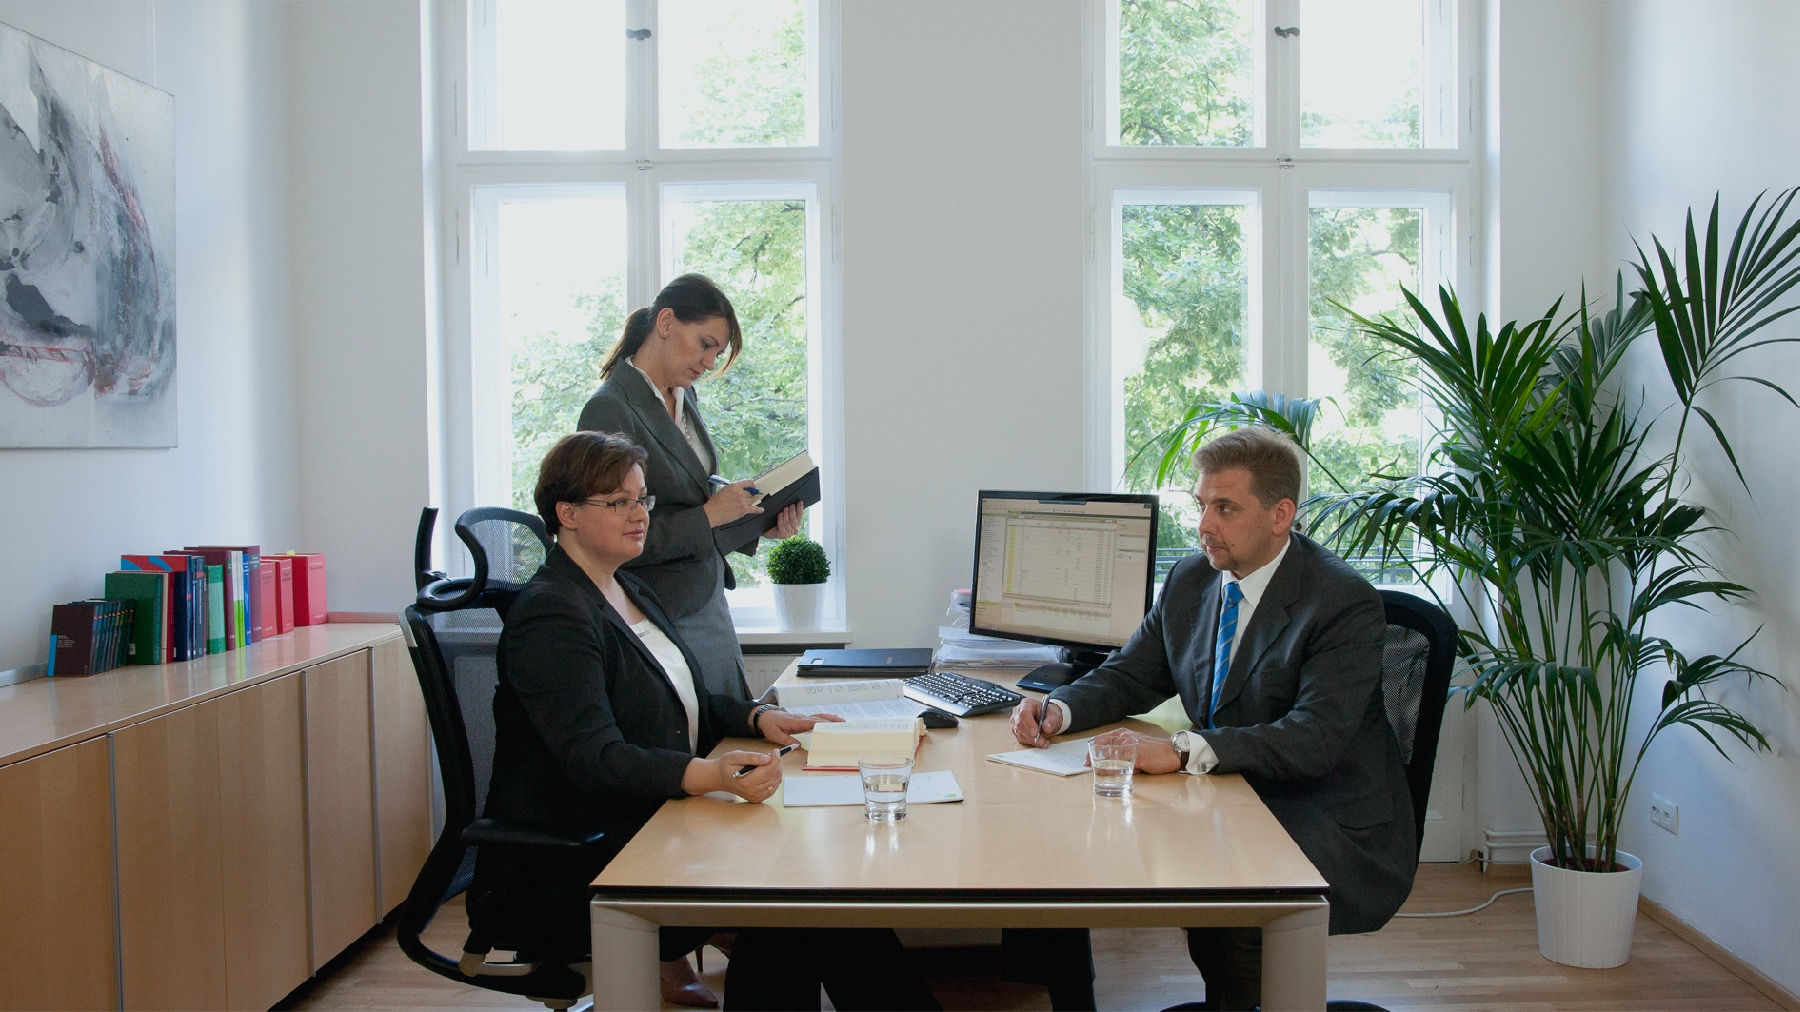 Steuerberatung-Irina-Karow